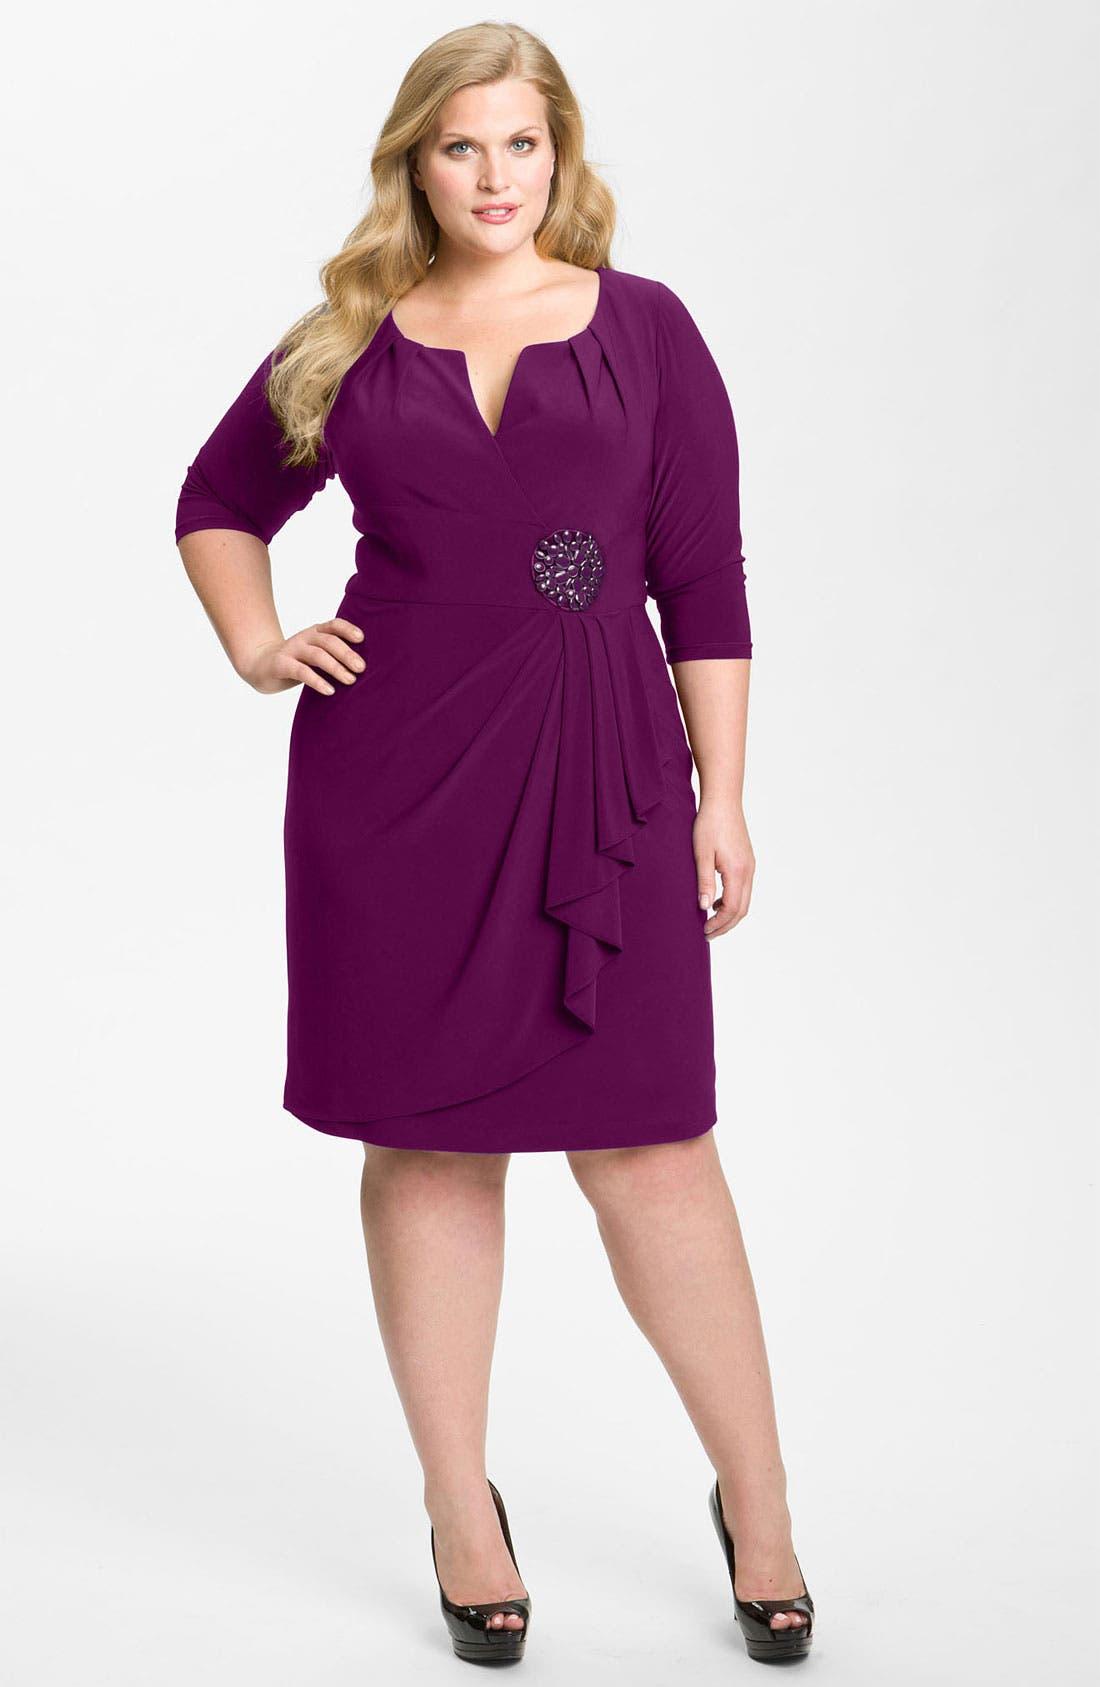 Alternate Image 1 Selected - Adrianna Papell Embellished Matte Jersey Sheath Dress (Plus)